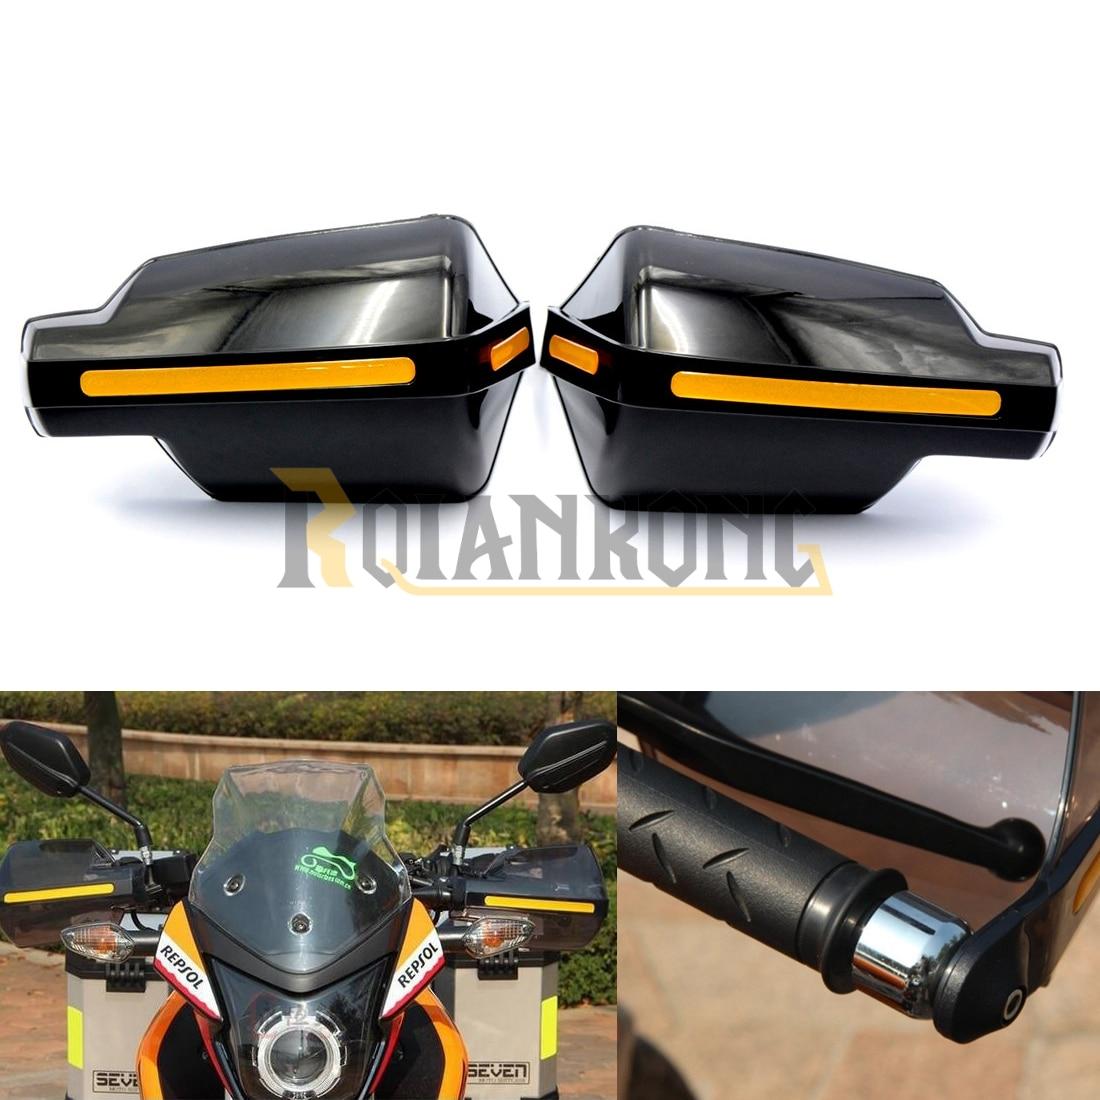 Motorcycle wind shield Brake lever hand guard For BMW S S1000 1000 1000R 1000RR  R RR S1000R S1000RR with Hollow Handle bar